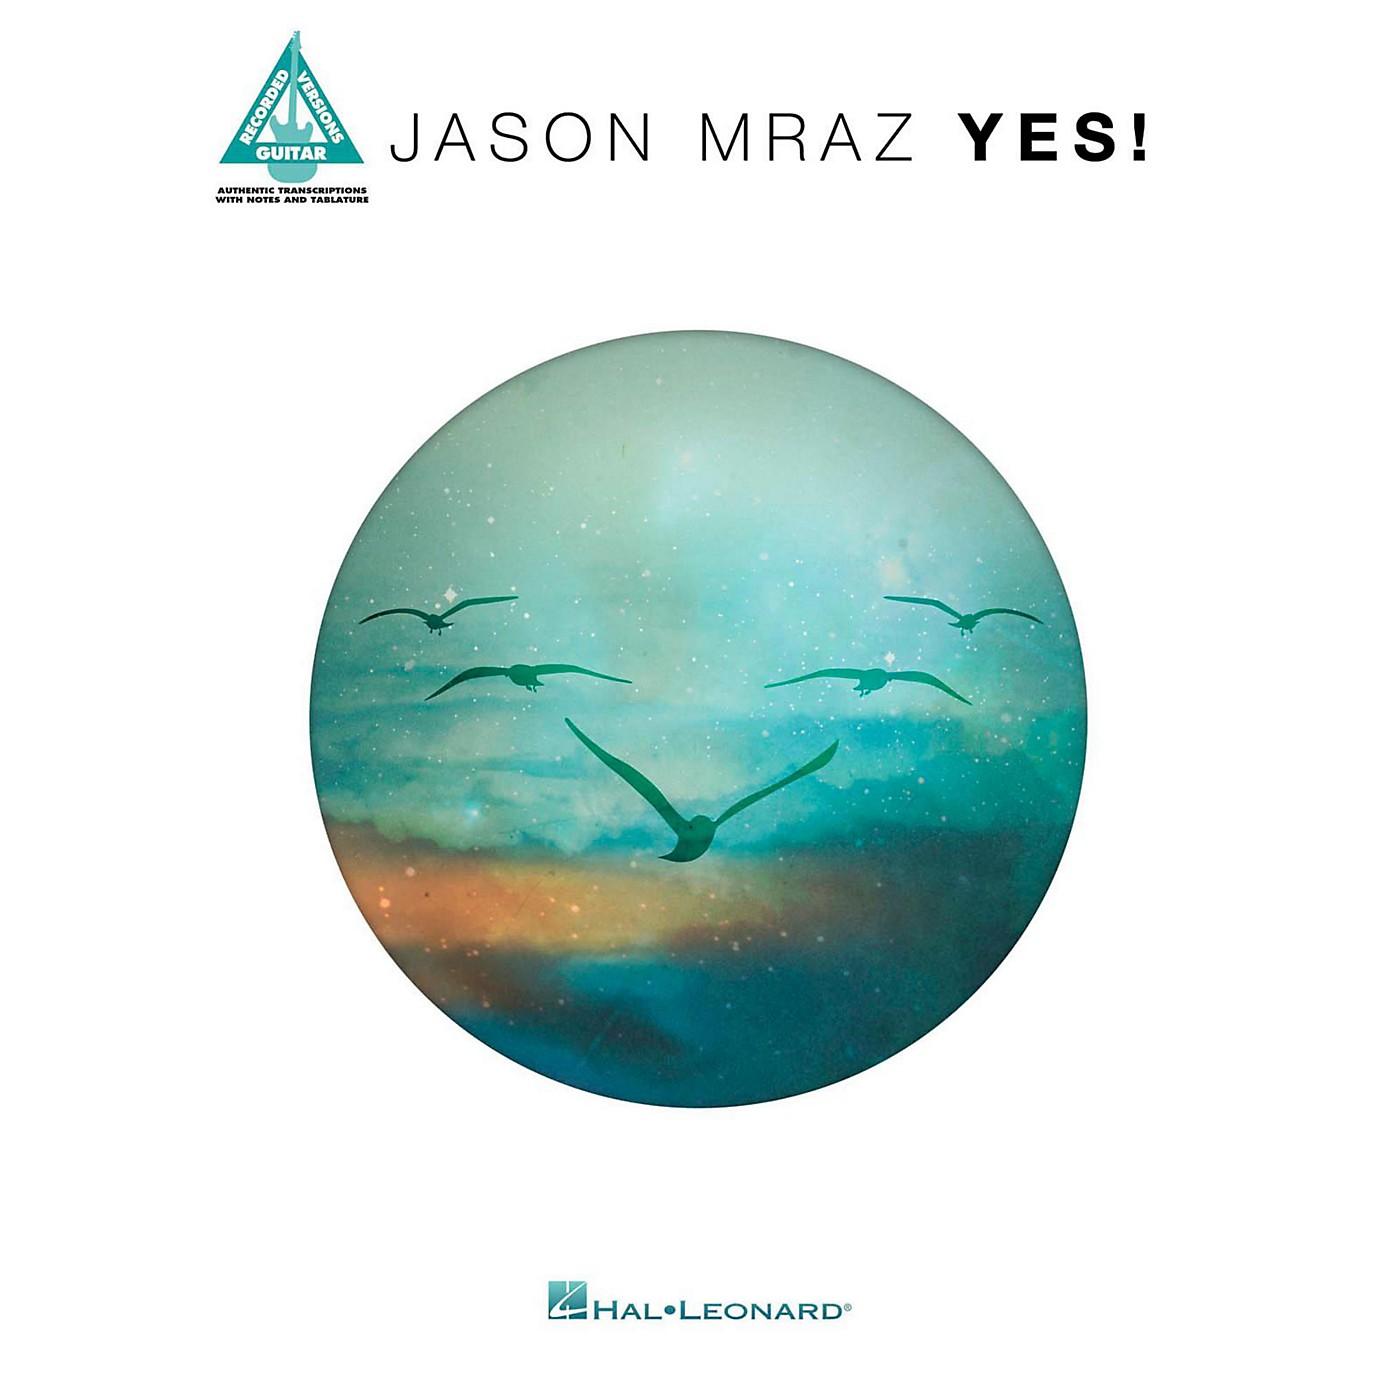 Hal Leonard Jason Mraz - Yes for Guitar Tab thumbnail